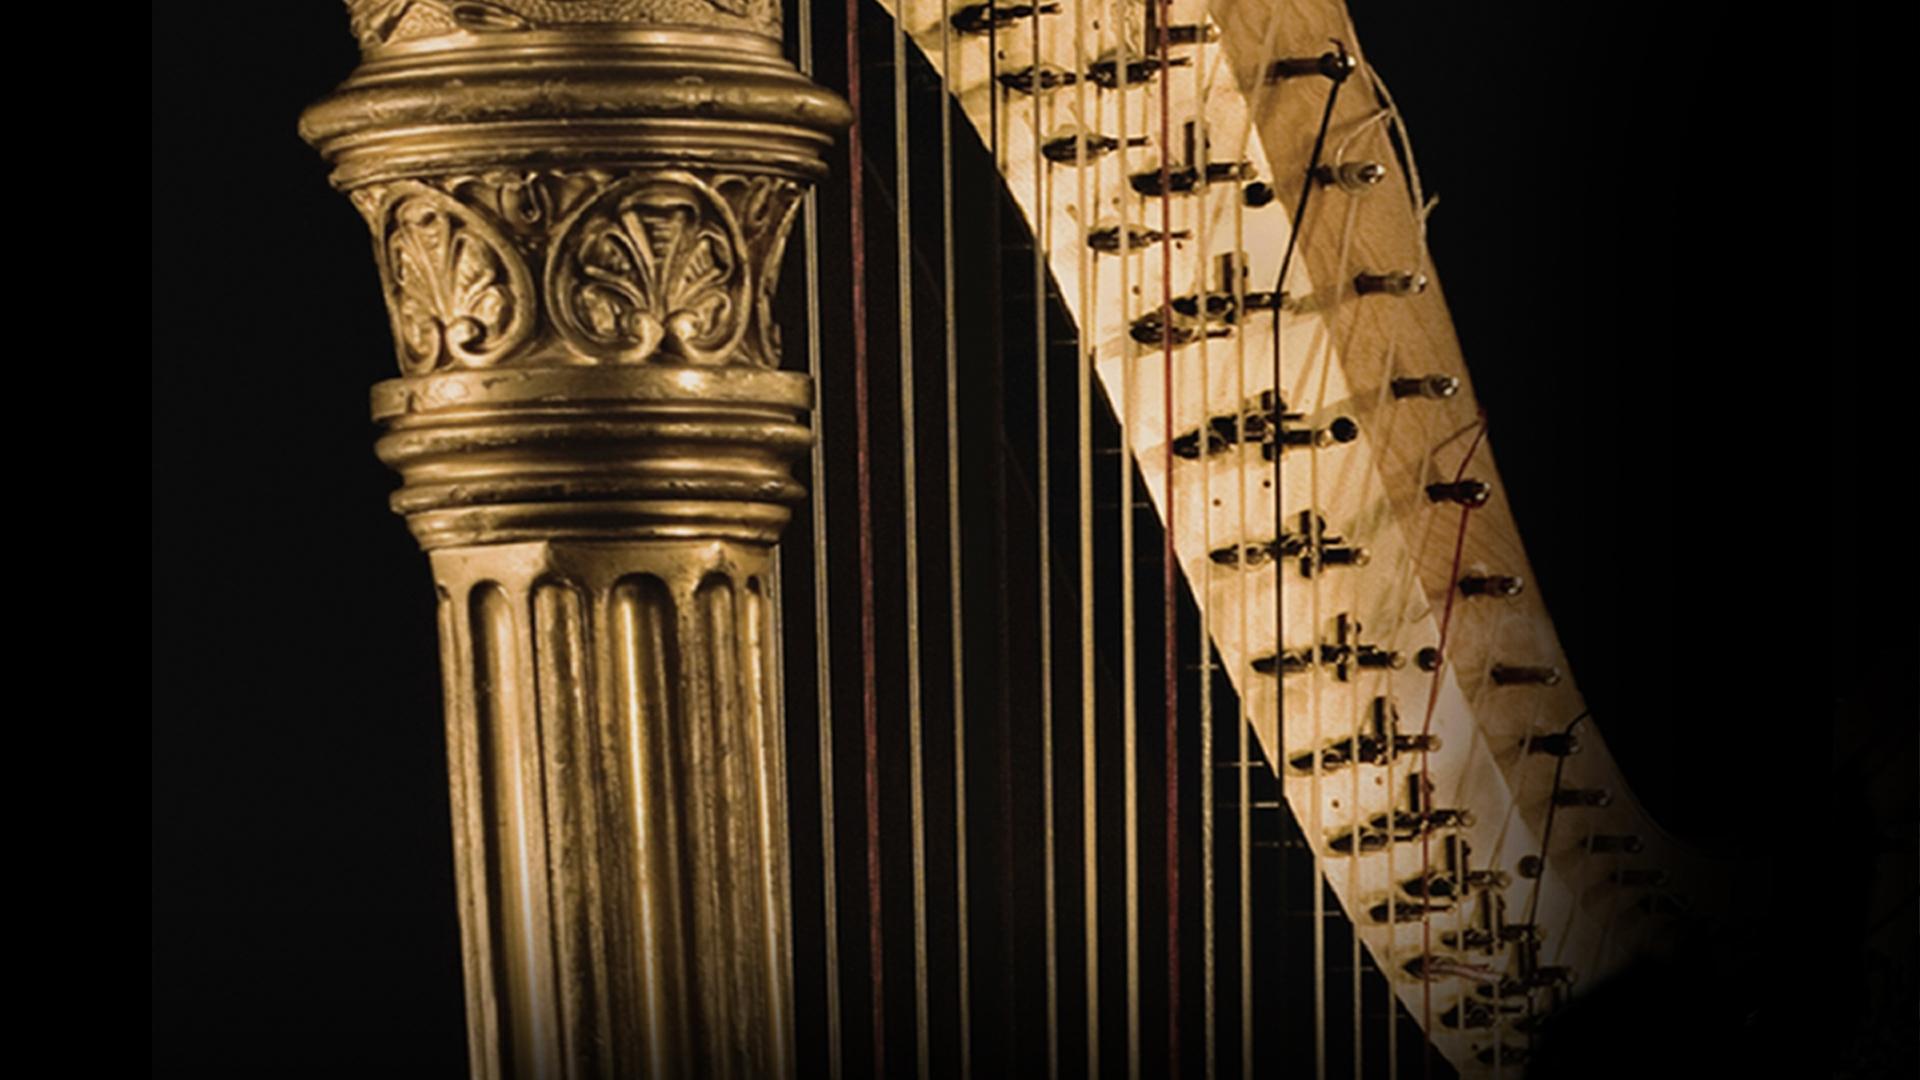 download harp HD Wallpaper General 285629 [1920x1200] for 1920x1080